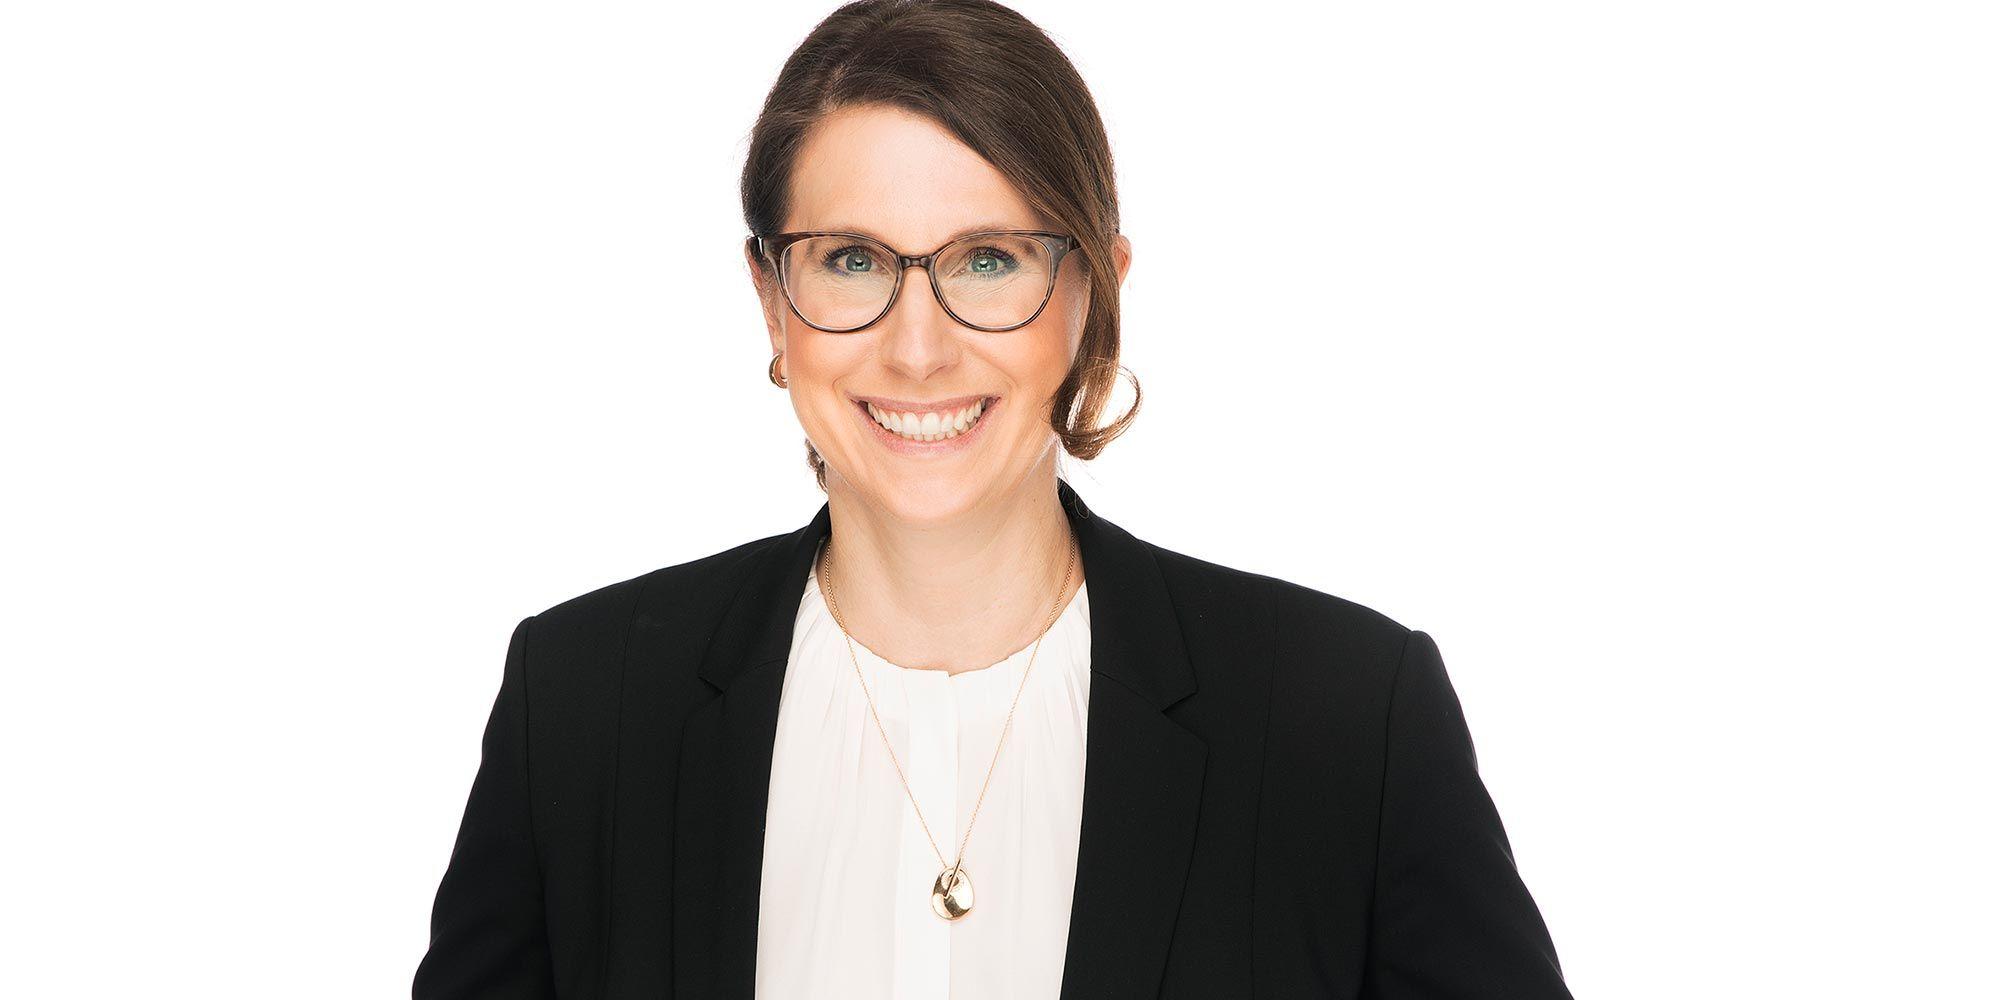 Dr. Annette Oschmann - Mediatorin & zertifizierte Coach für Conscious Uncoupling